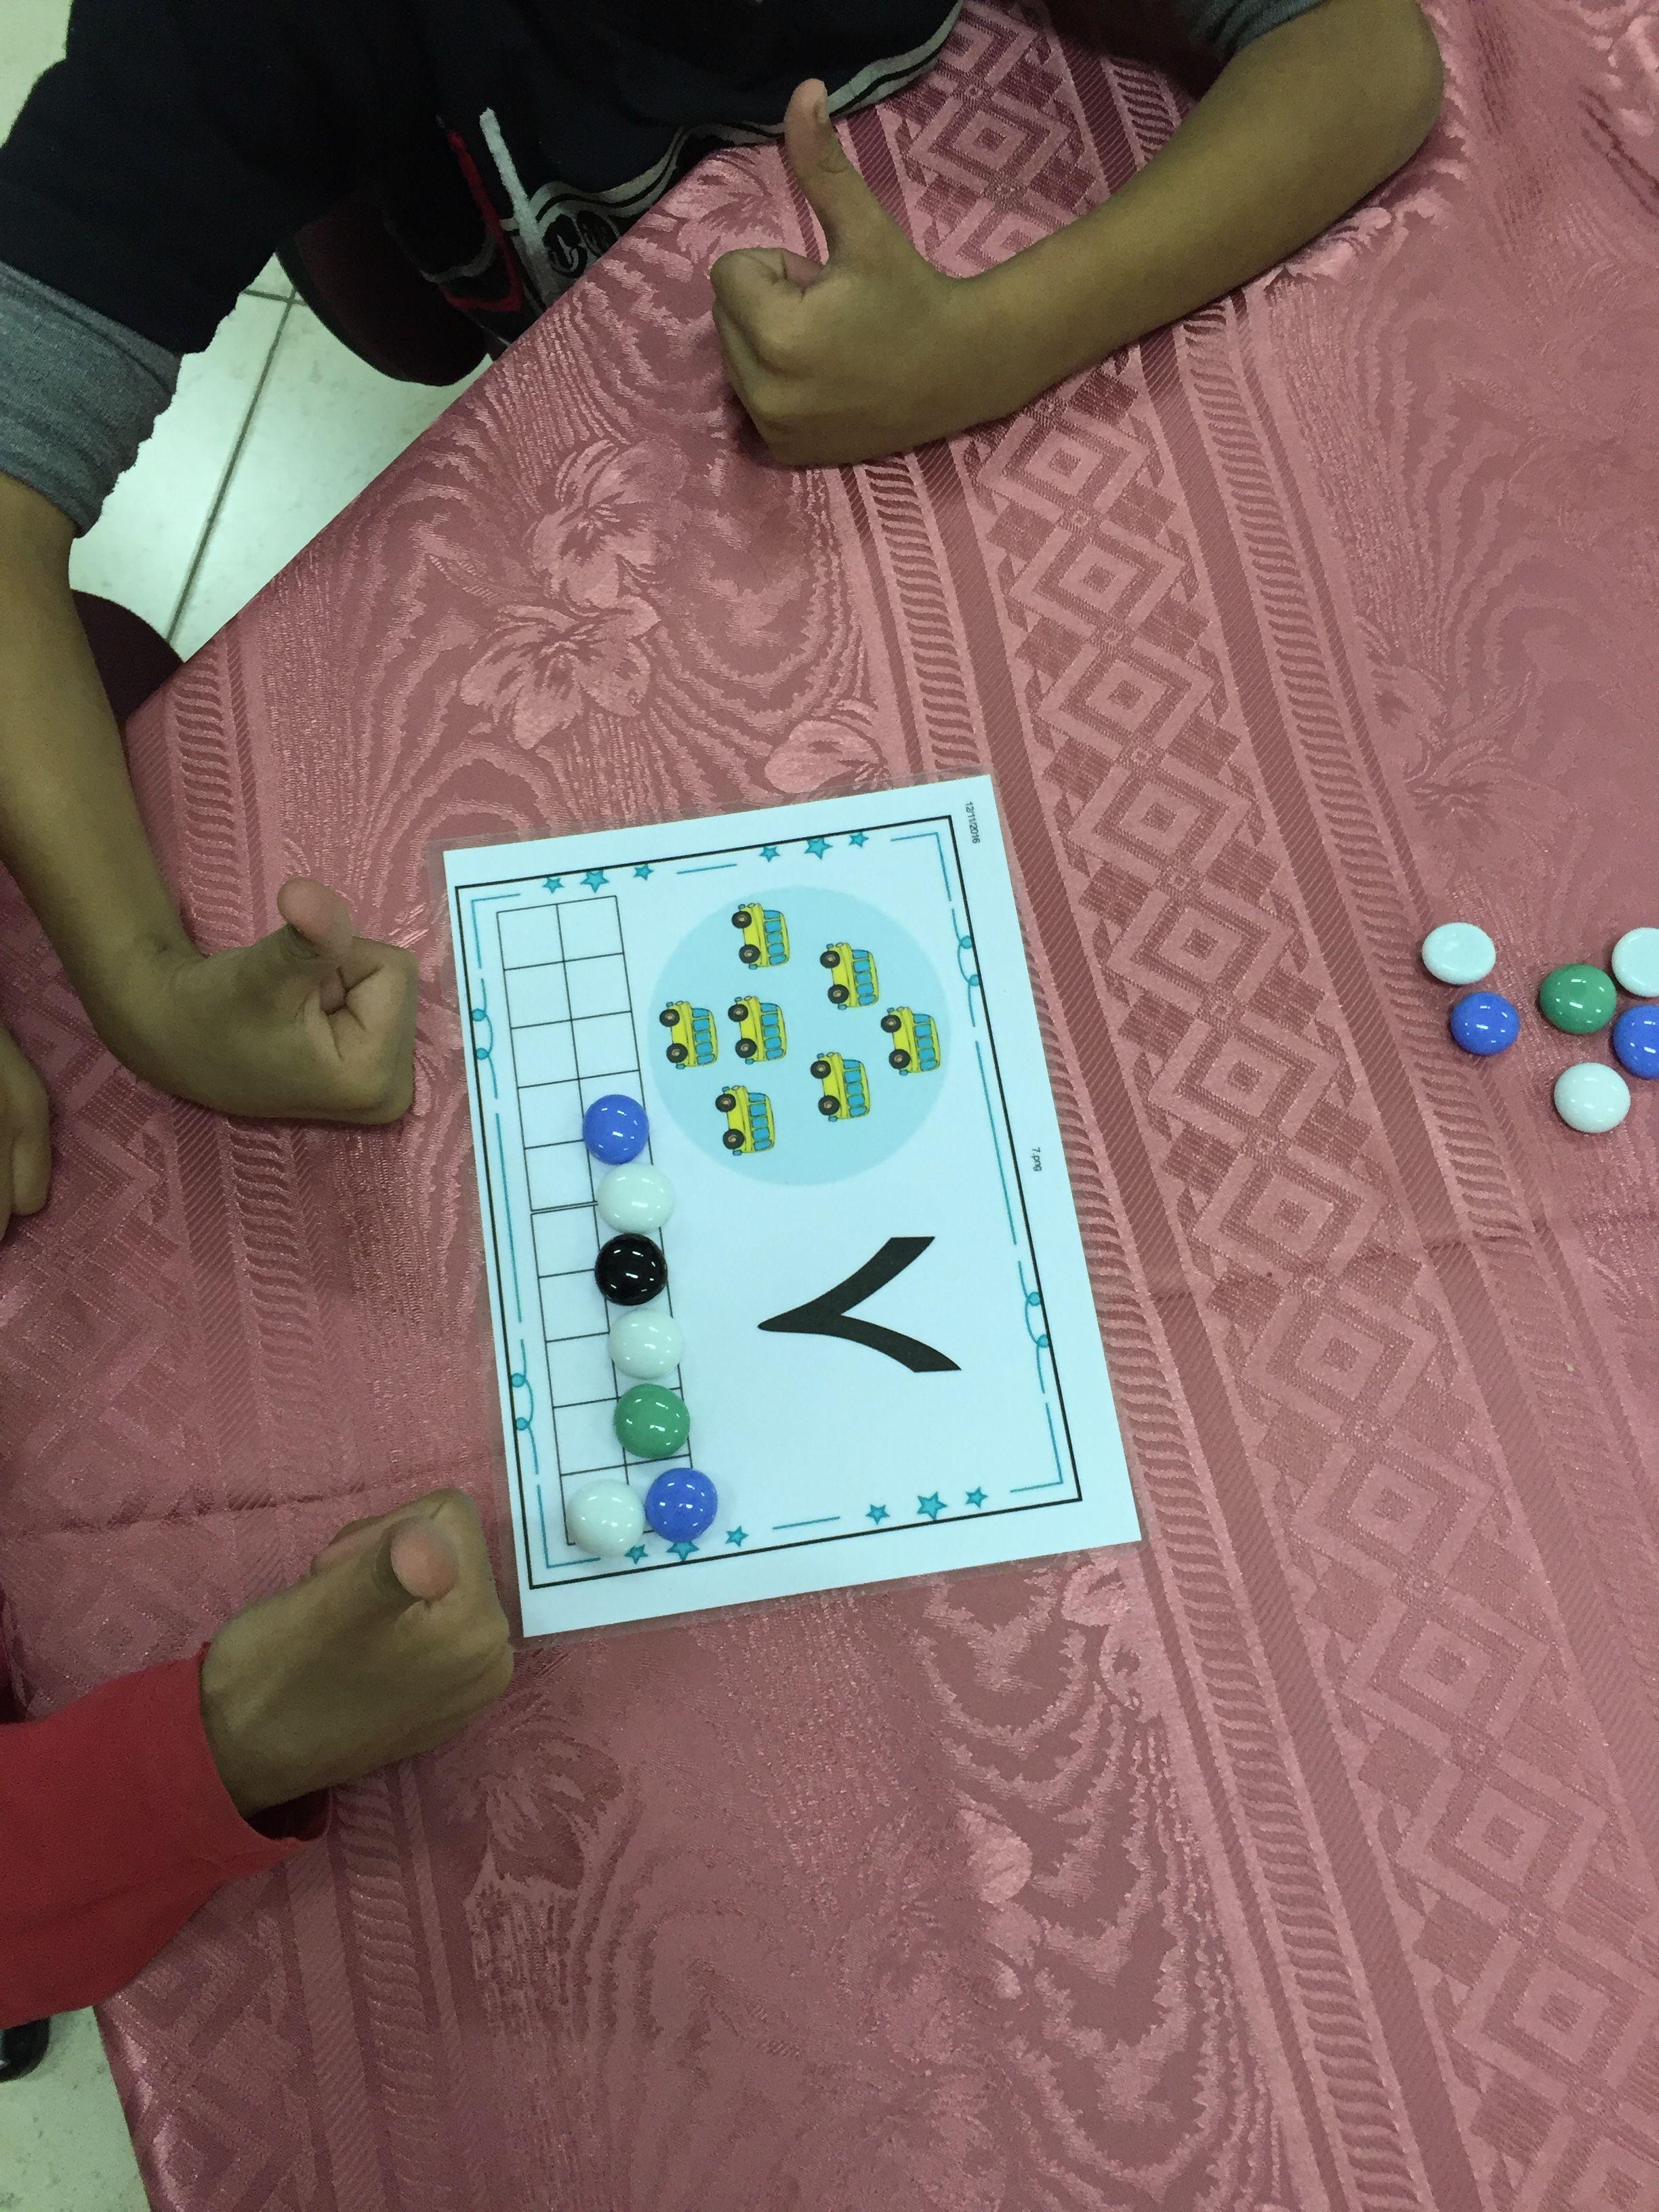 Pin By رياضيات الشراري On رياضيات المعلم صالح بشير الشراري Electronic Products Tablet Electronics